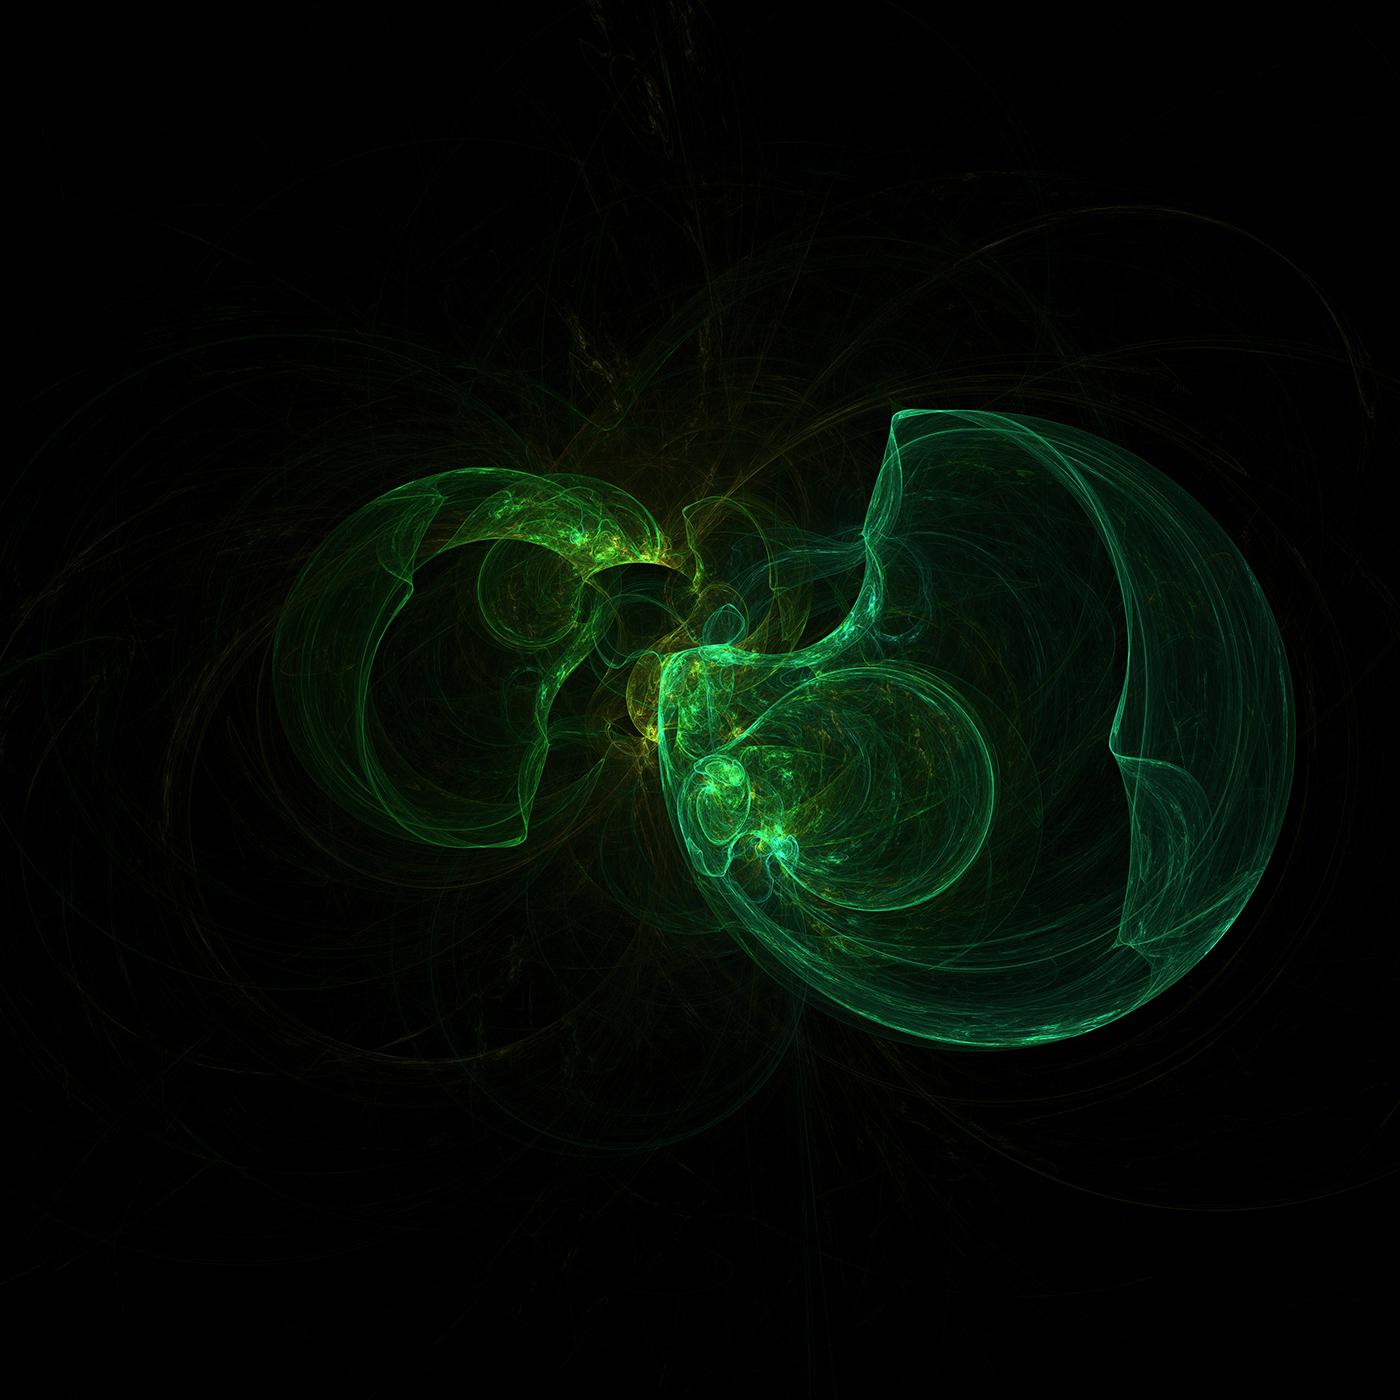 annihilation,chaos,flame,fractal,infinite,loop,maths,mandelbrot